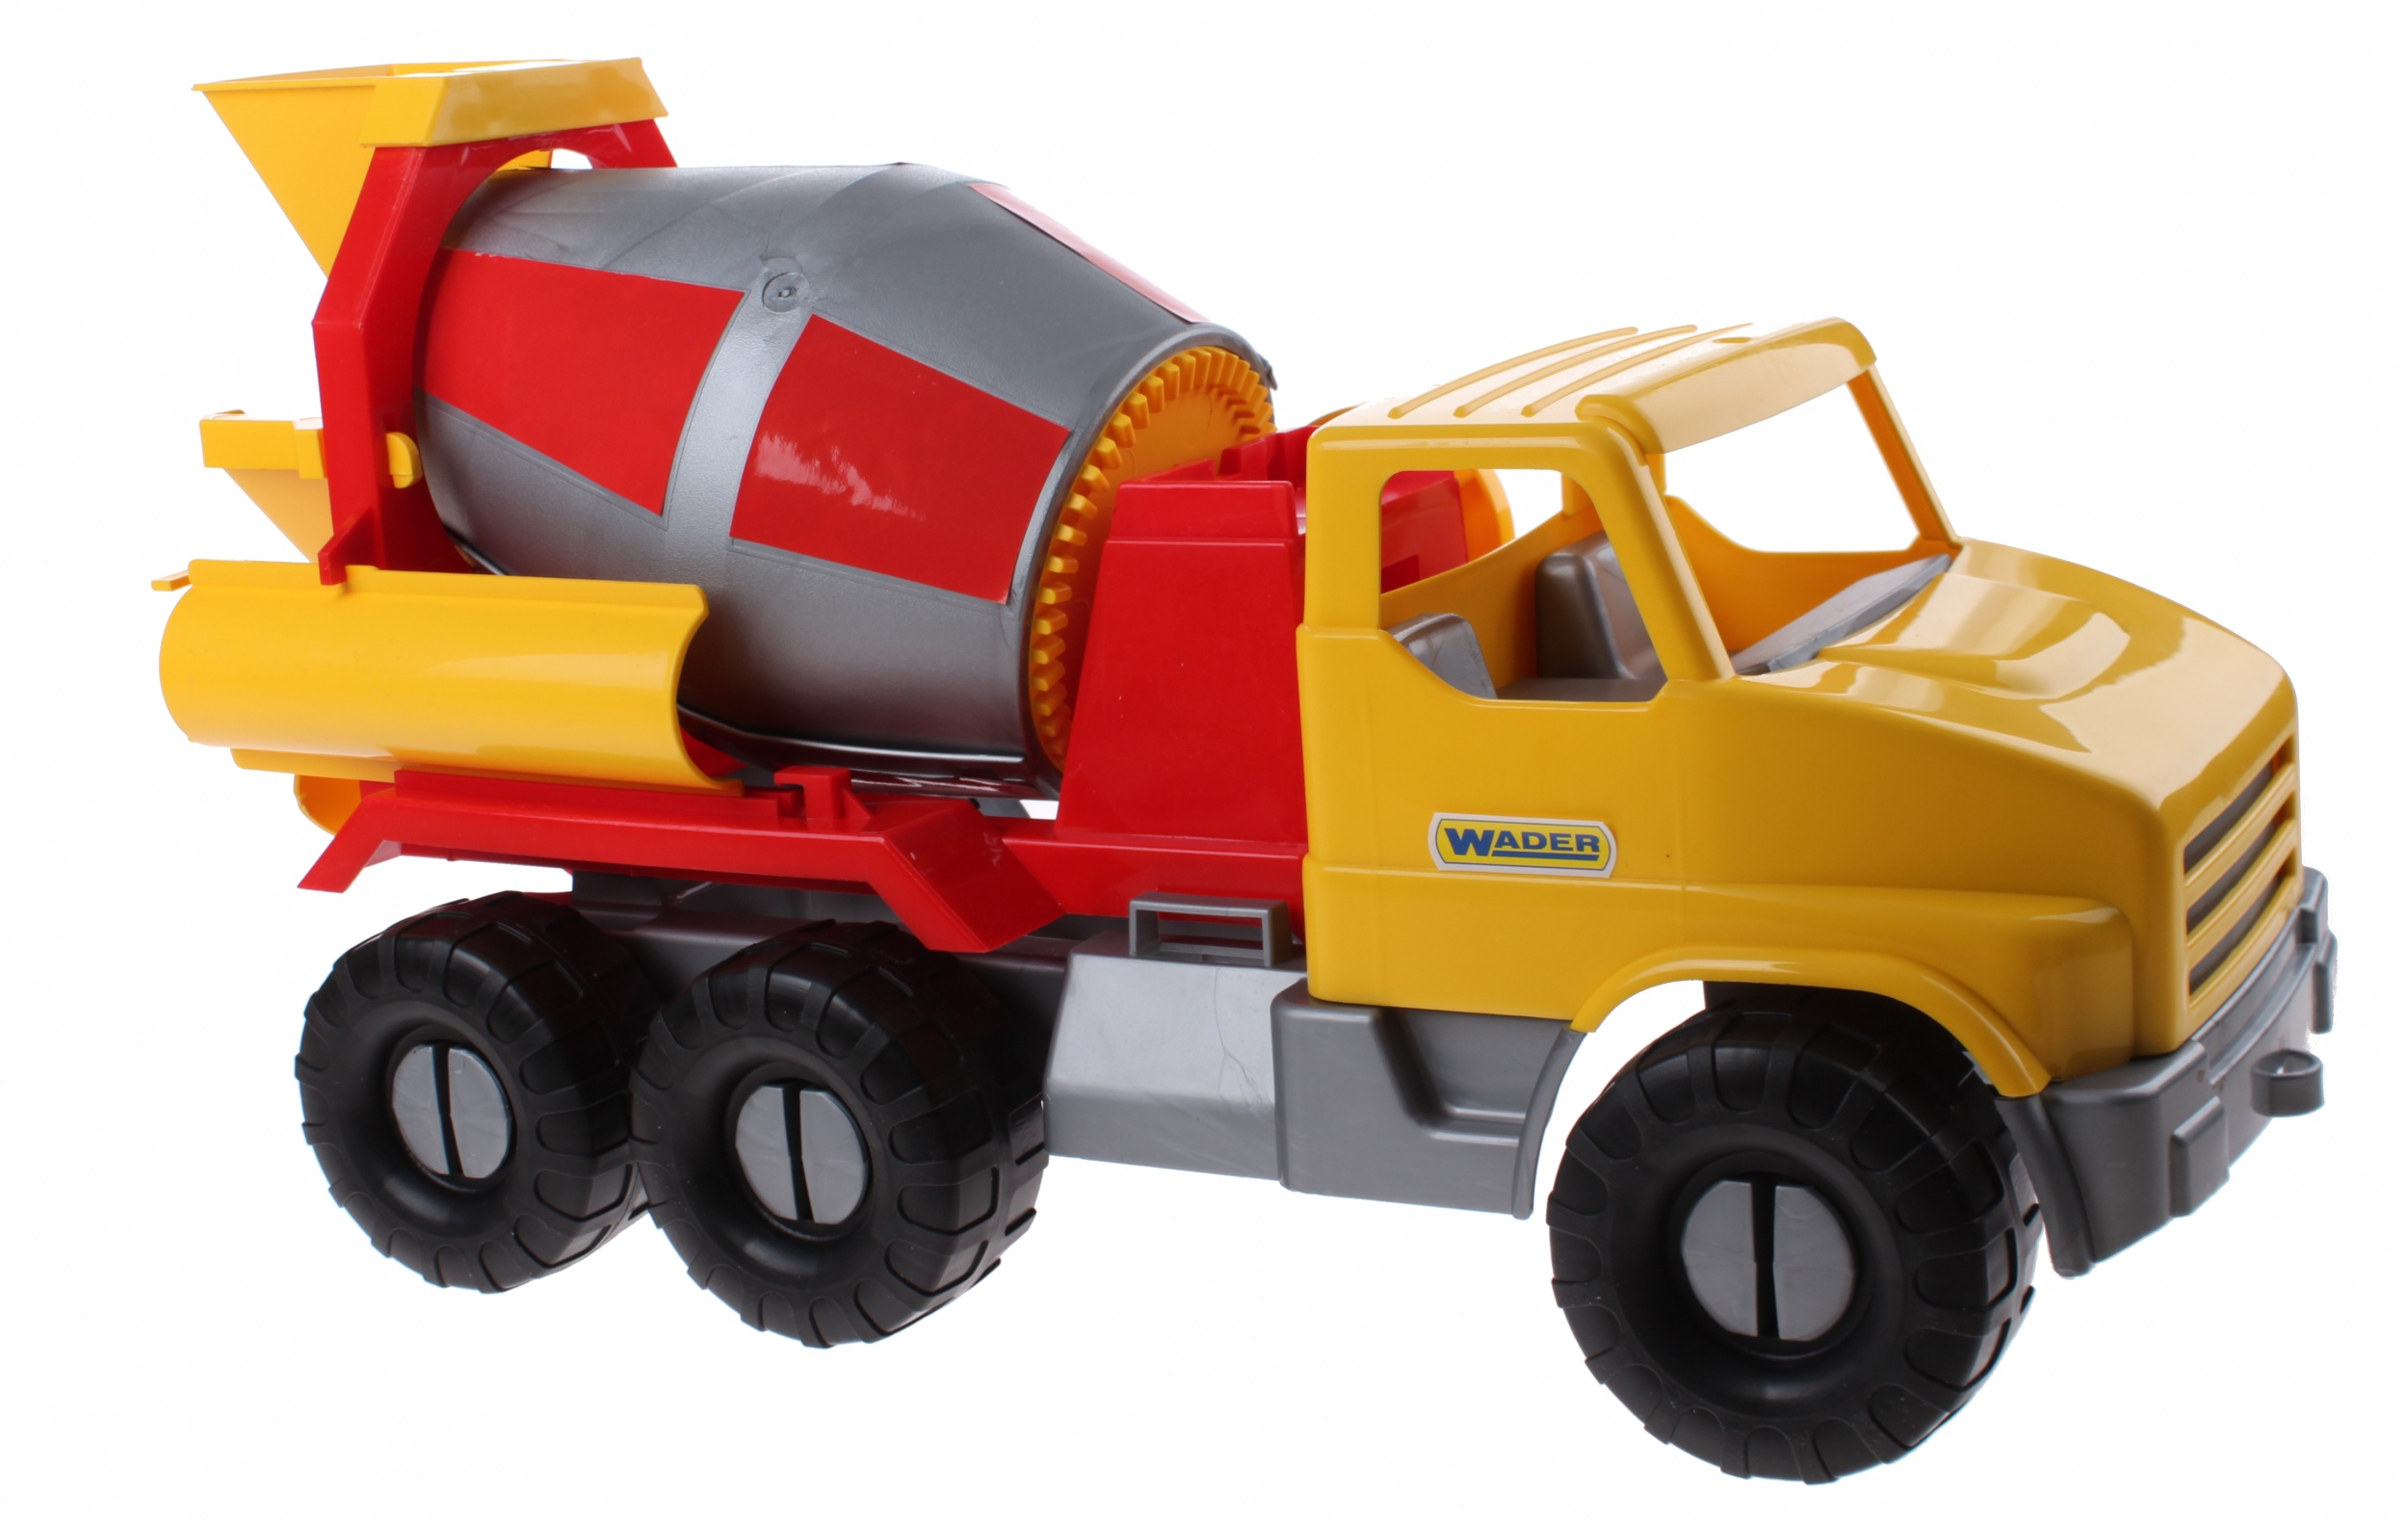 Speelgoed Garage Wader : Wader speelgoed betonwagen geel cm internet toys